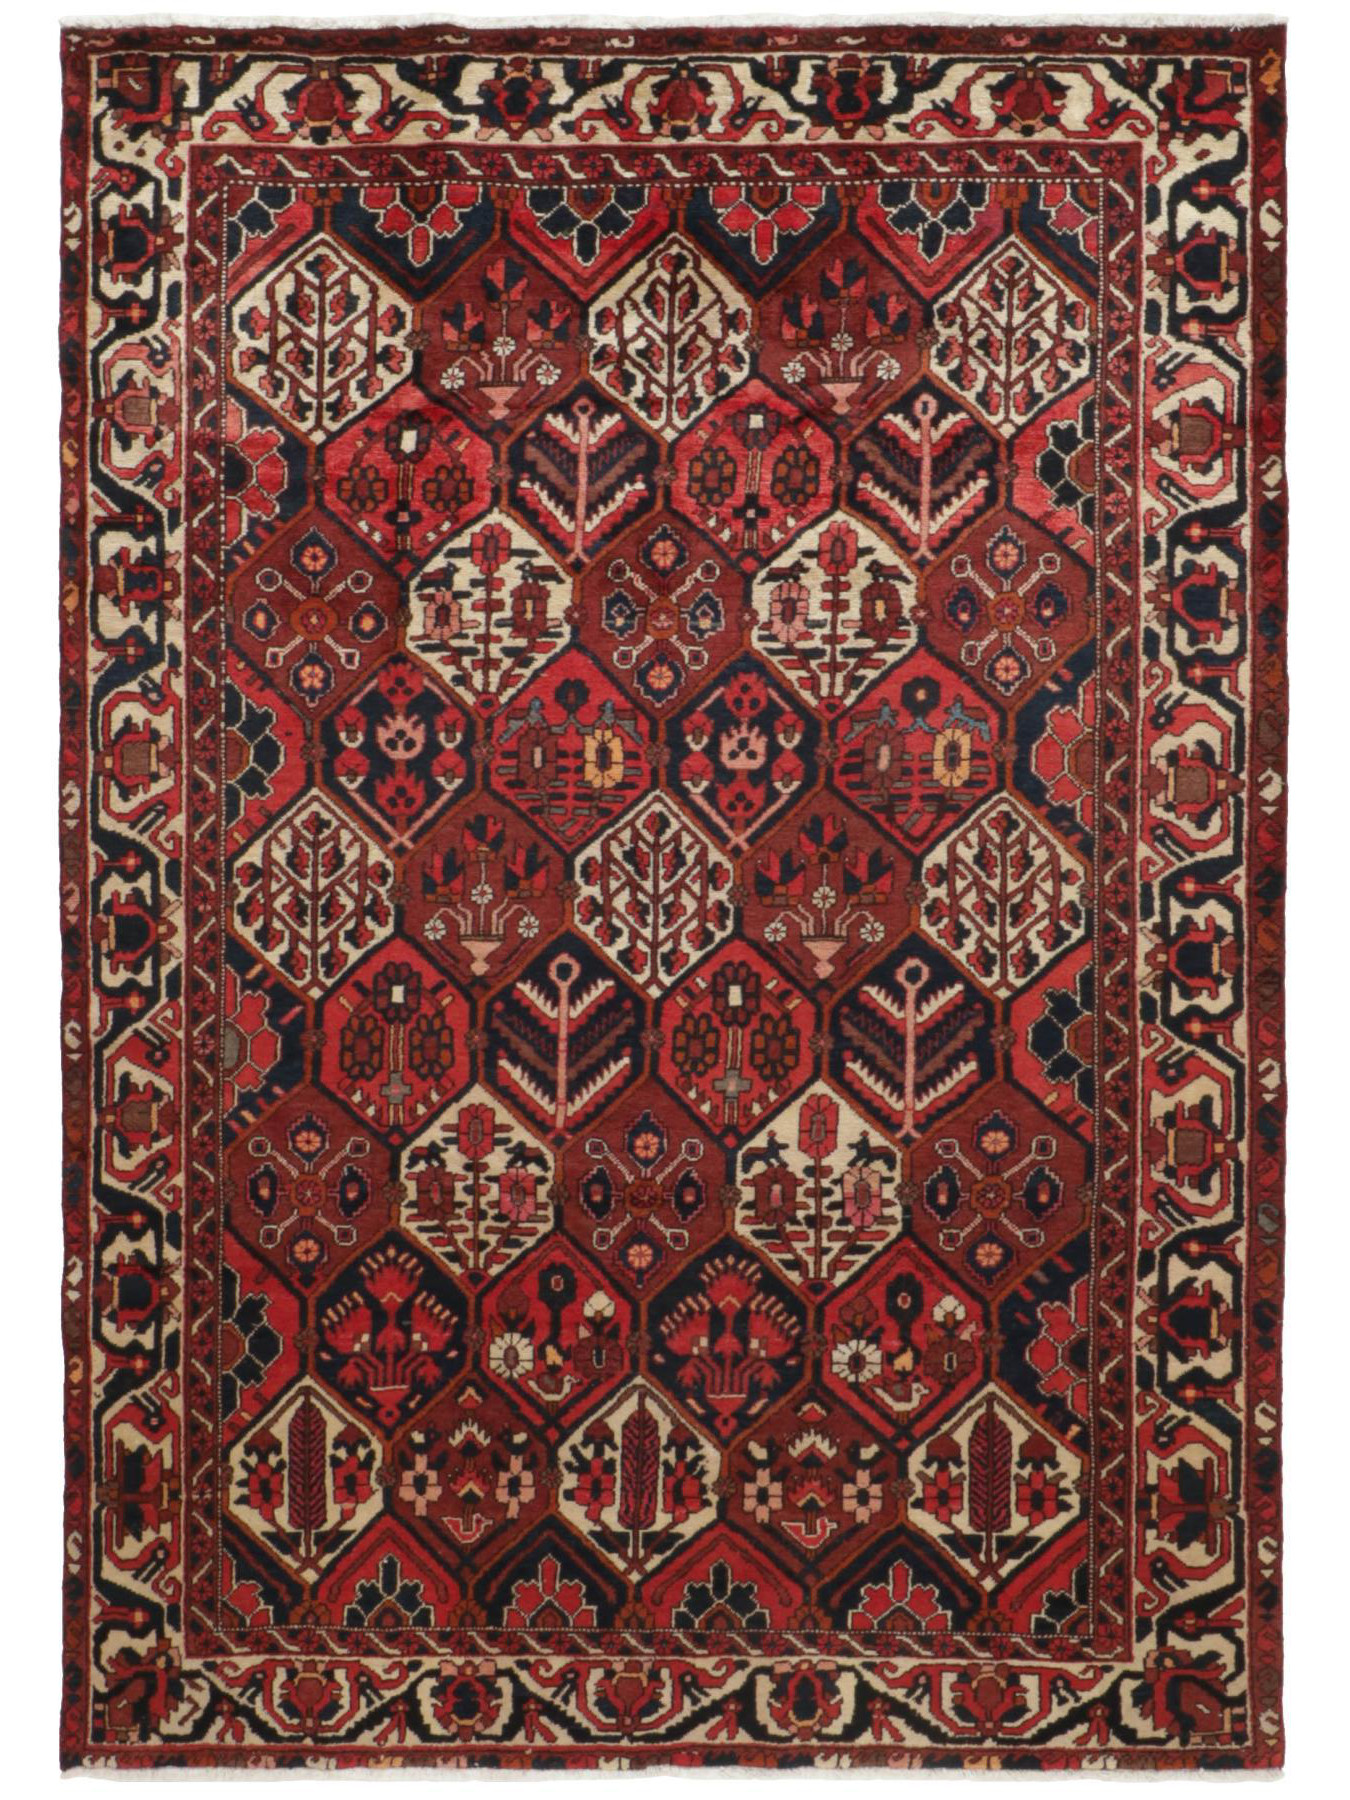 bakhtiar tapis persans n 37482 285x213cm. Black Bedroom Furniture Sets. Home Design Ideas